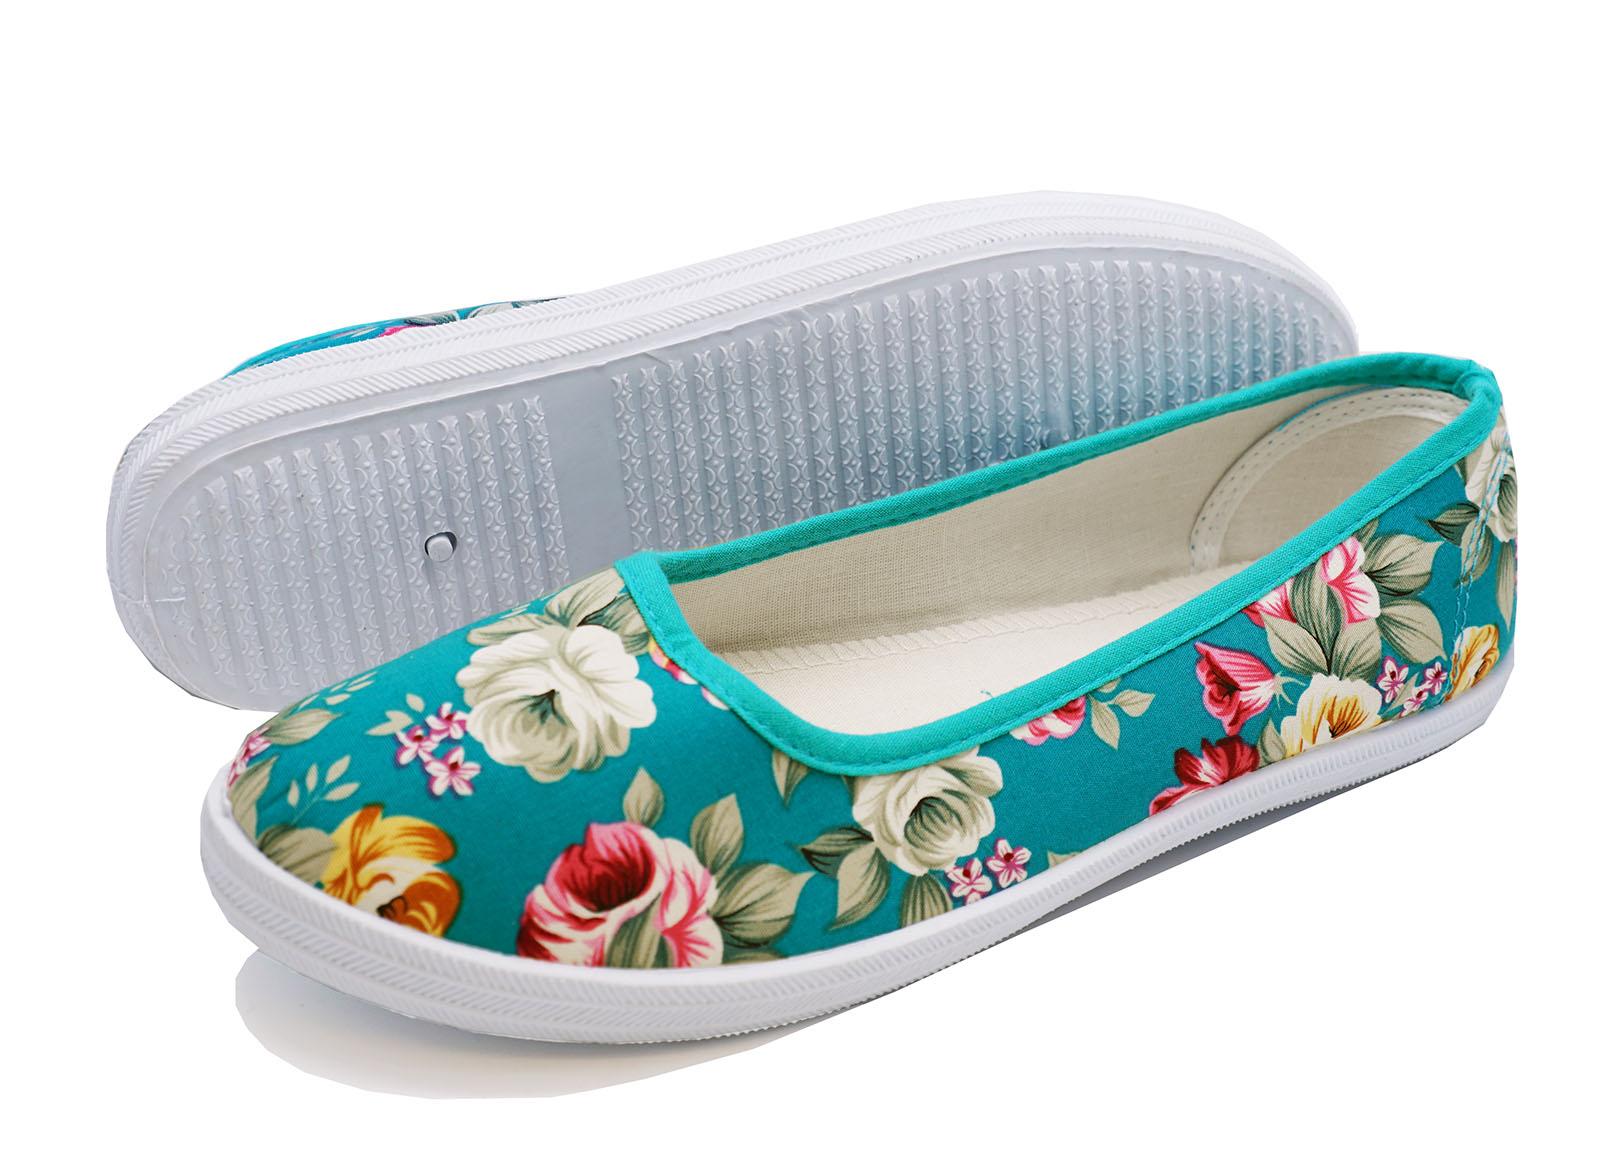 Damas Verde Floral Lona Plana Slip-on Playera Bombas Zapatos Informales Tallas 3-8